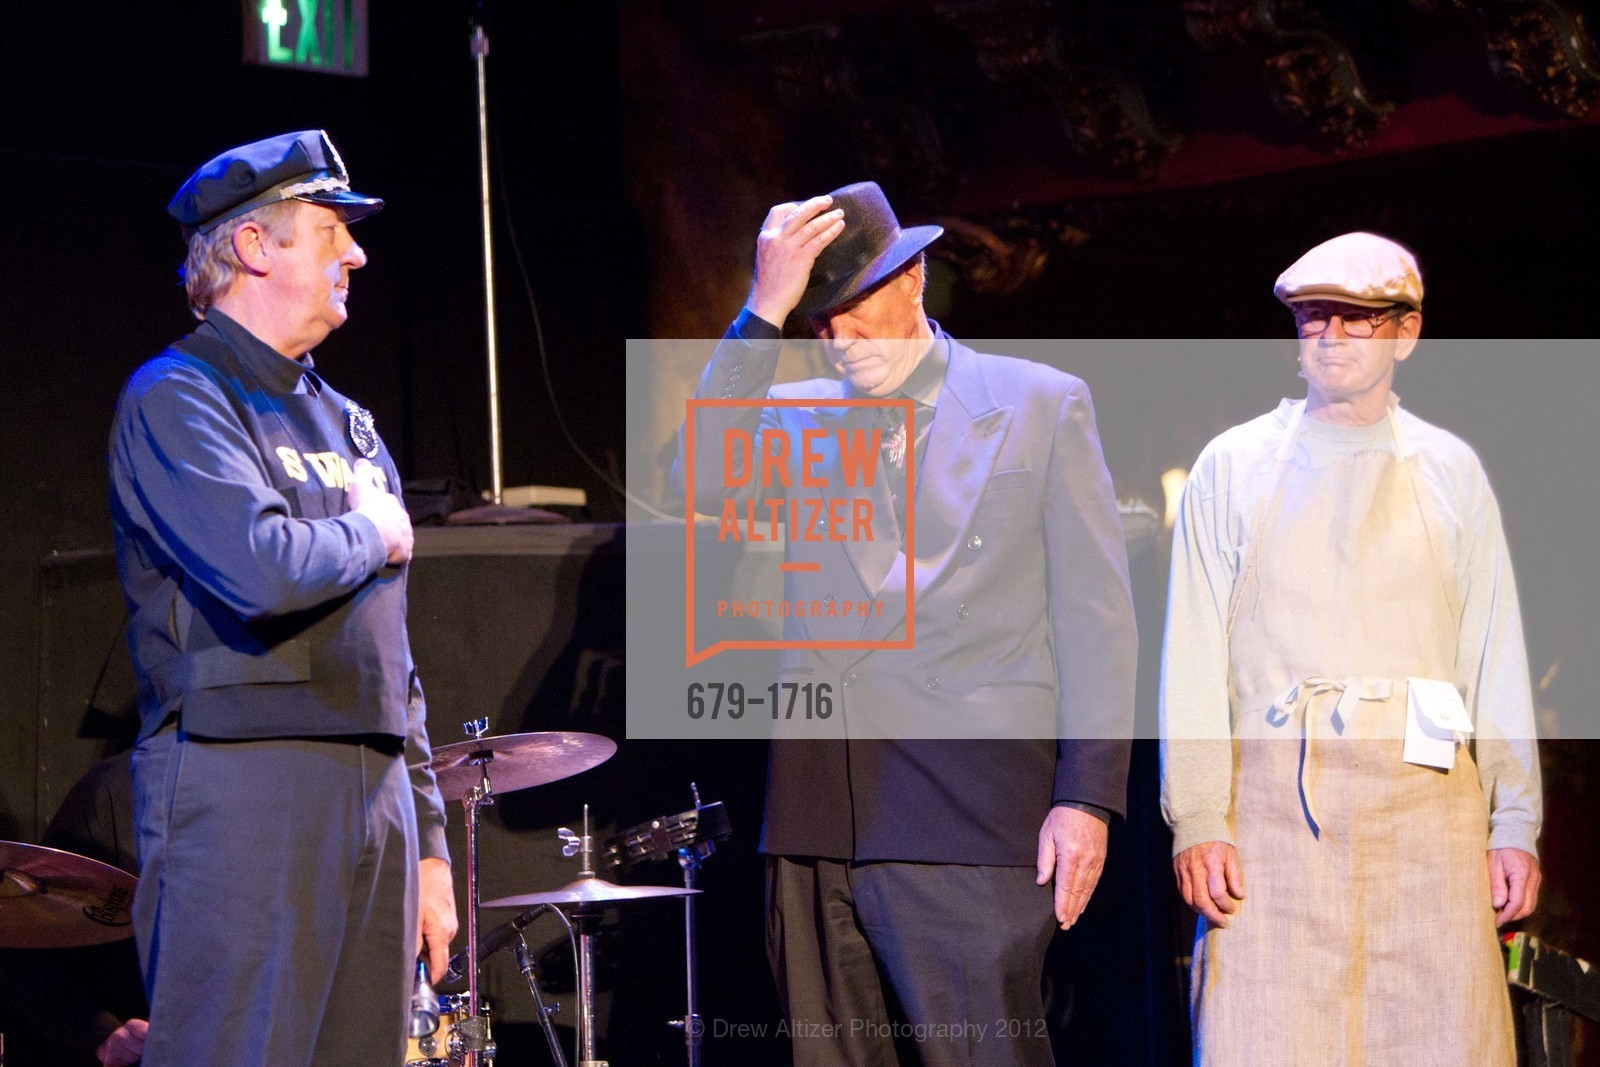 Performance, Photo #679-1716